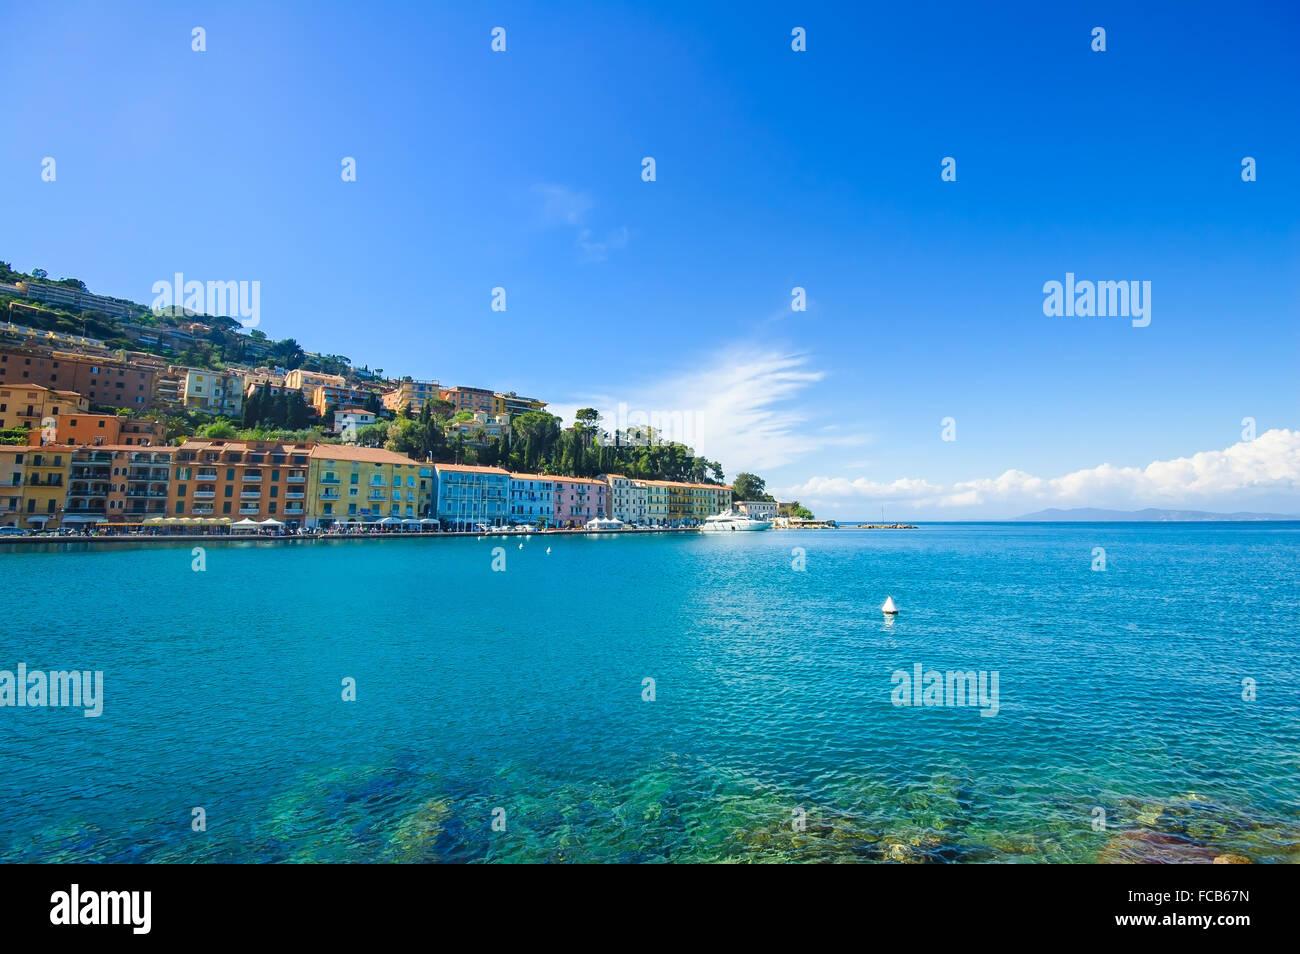 Porto Santo Stefano seafront promenade, italian travel destination. Argentario, Tuscany, Italy. - Stock Image